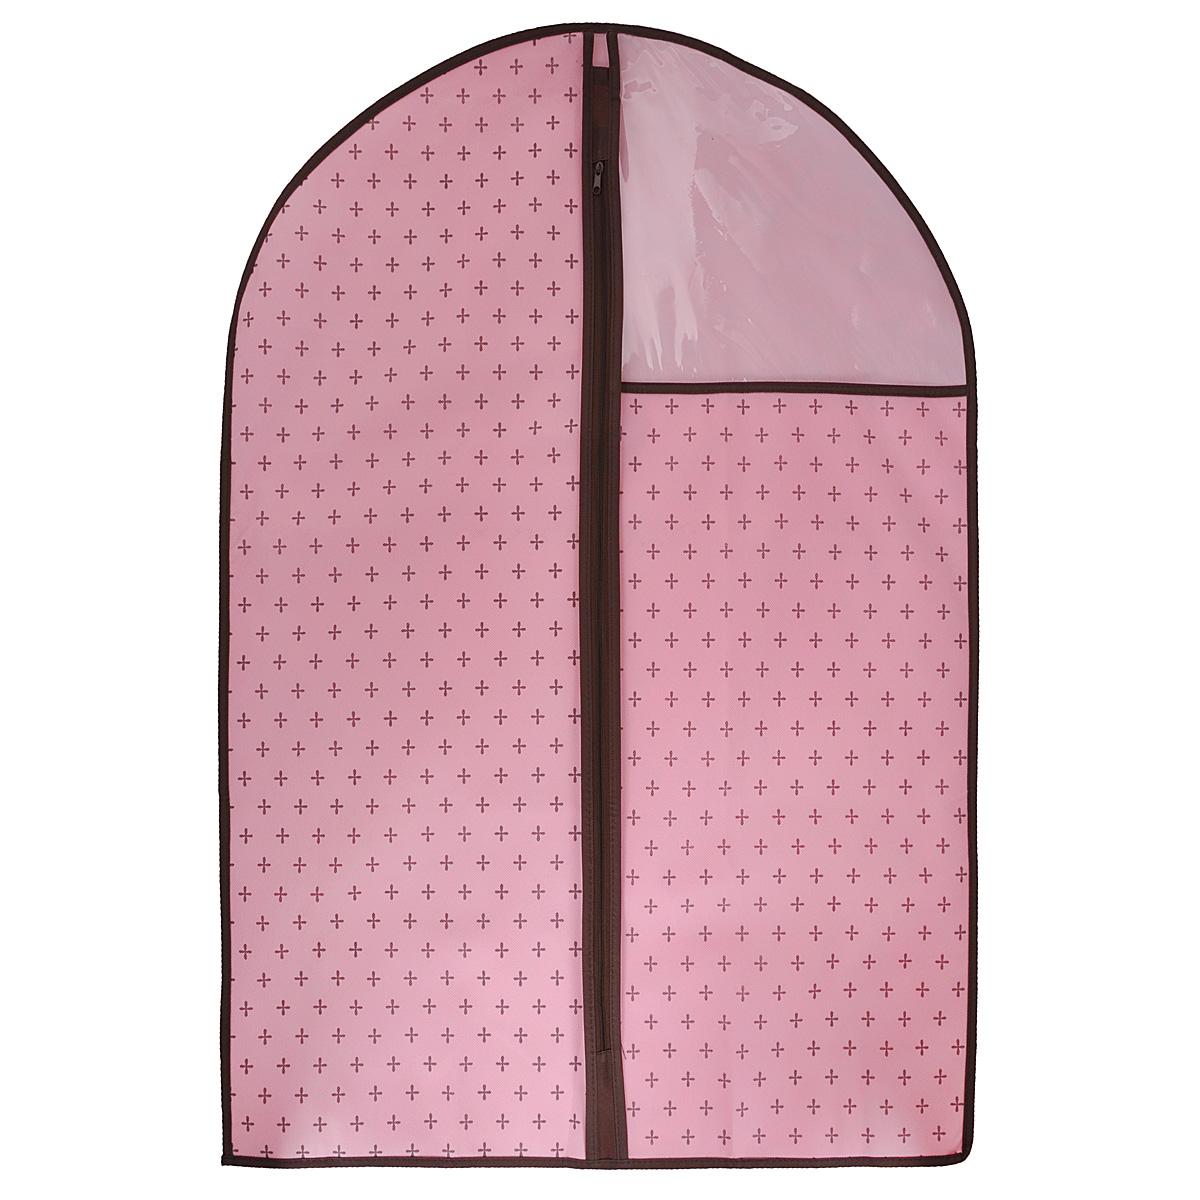 Чехол для одежды FS-6502M-W, цвет: розовый, 60 см х 120 см эйч энд эм рязань каталог одежды